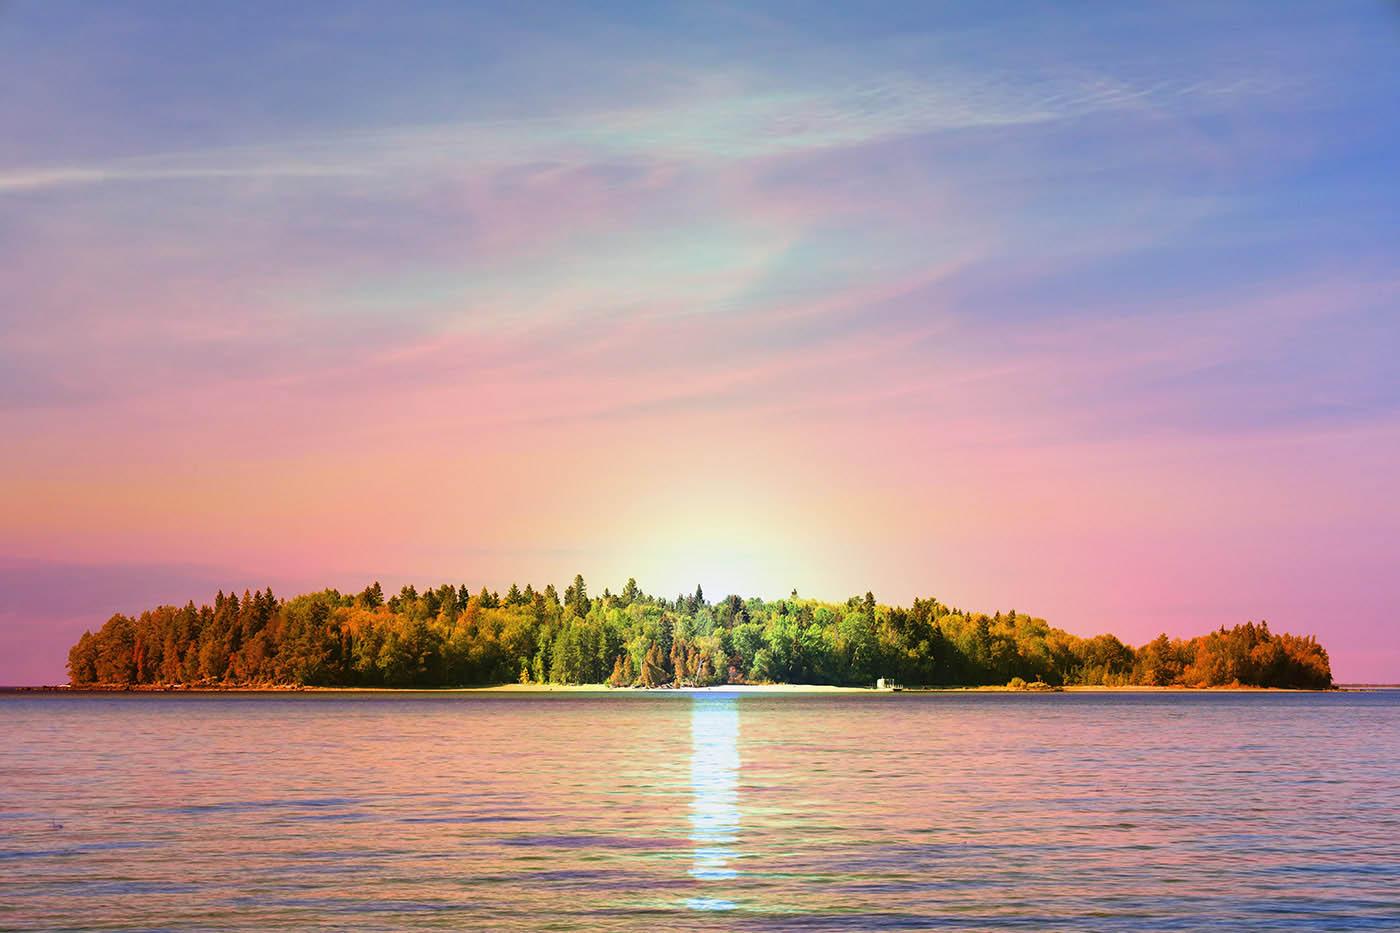 Peaceful-Remote-Island